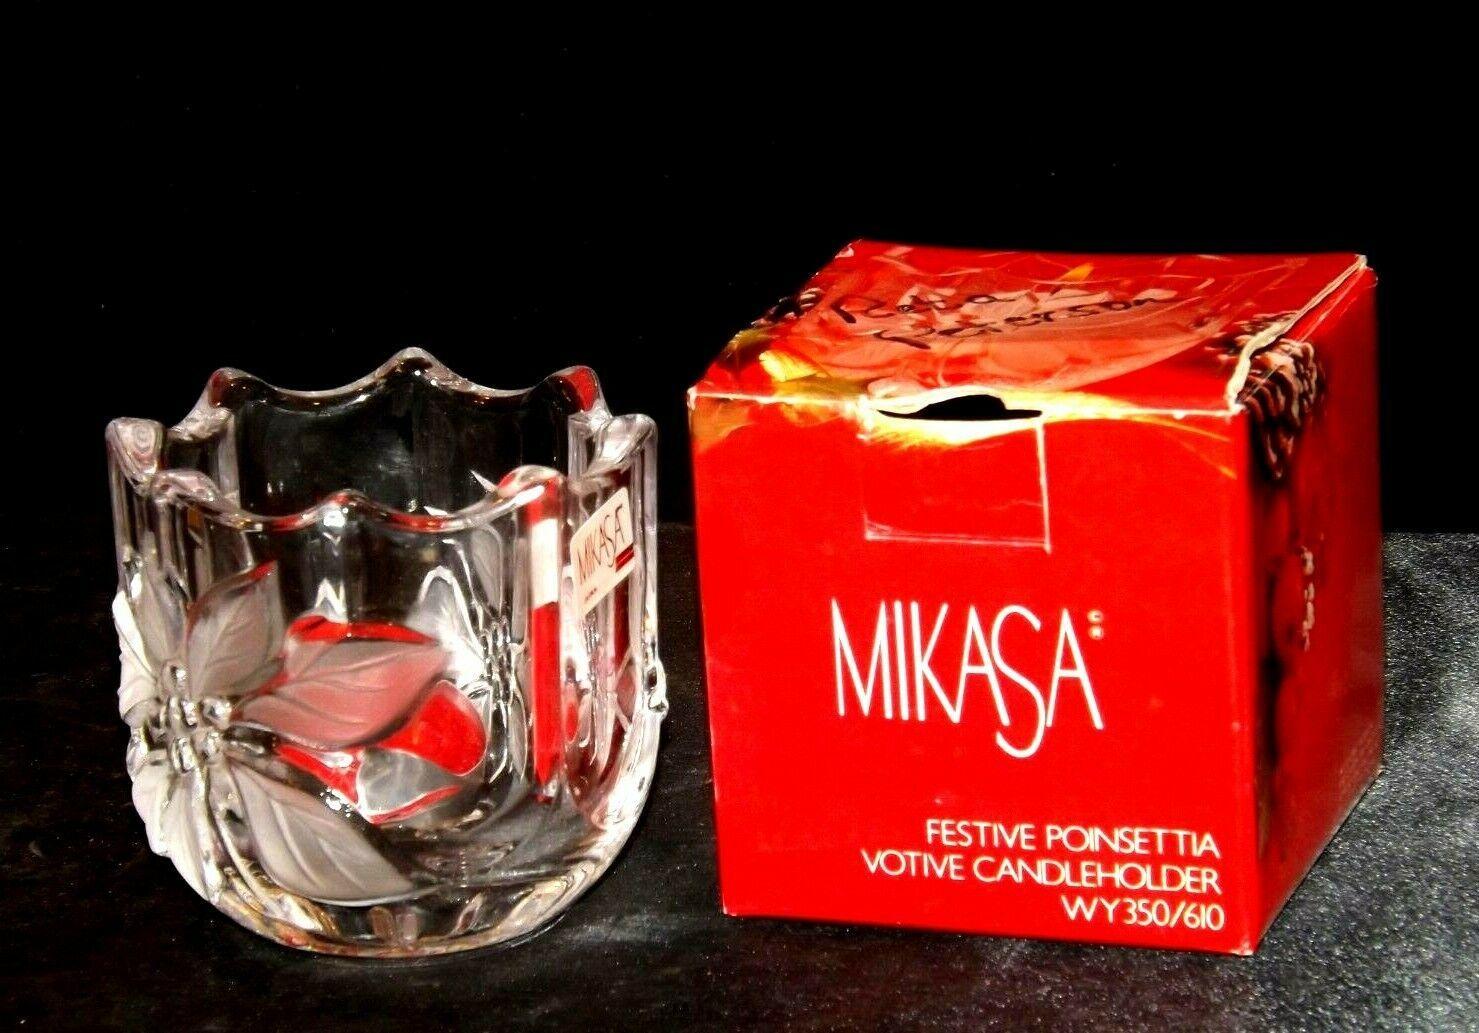 Milkasa Festive Poinsettia Votive Candle Holder AA19-1608 Vintage